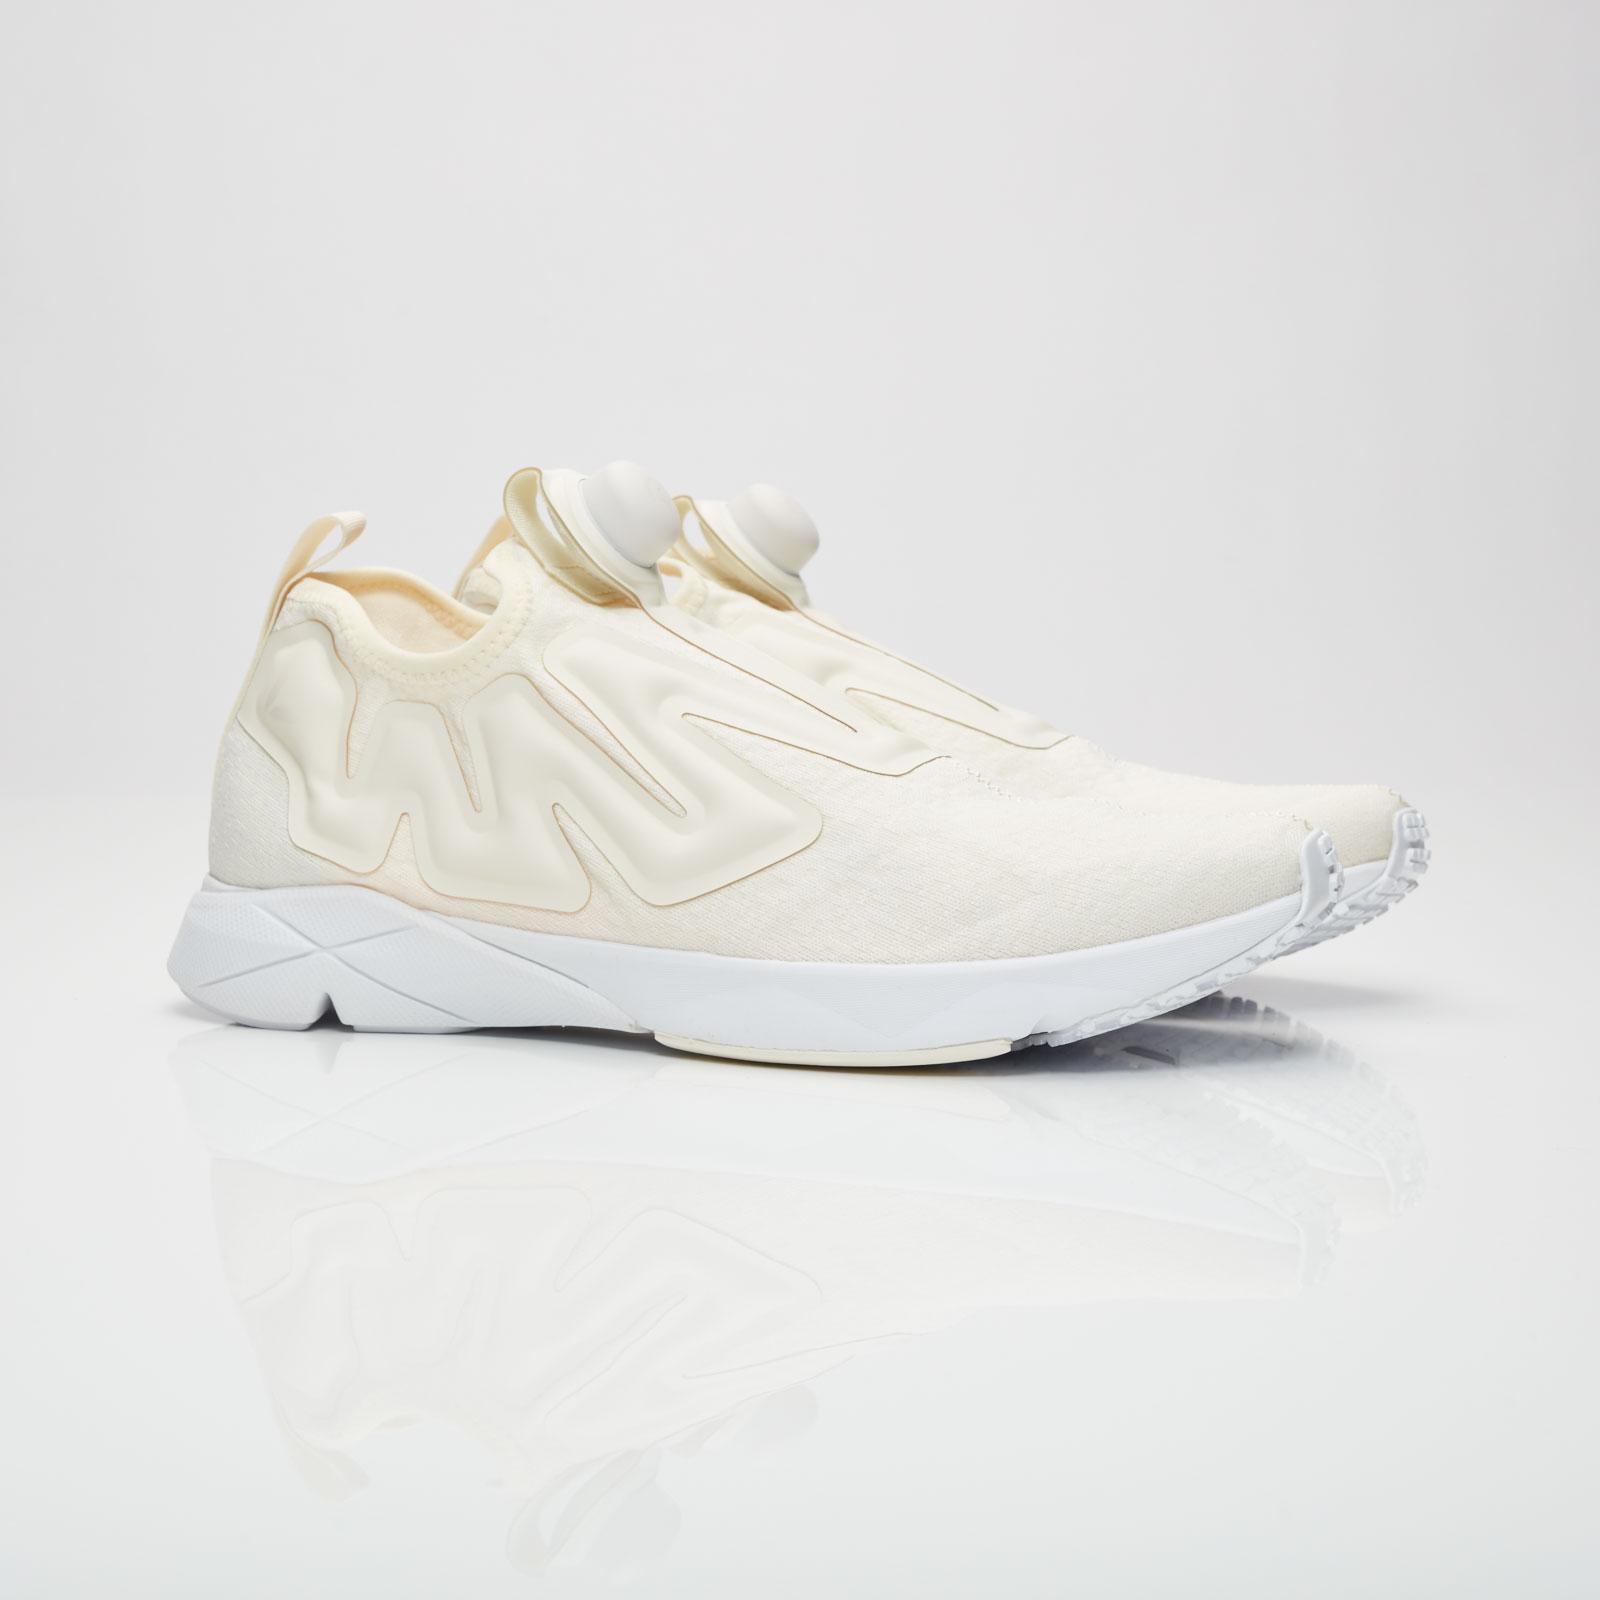 93157af41860f8 Reebok Pump Plus Supreme Rilla - Bs7048 - Sneakersnstuff